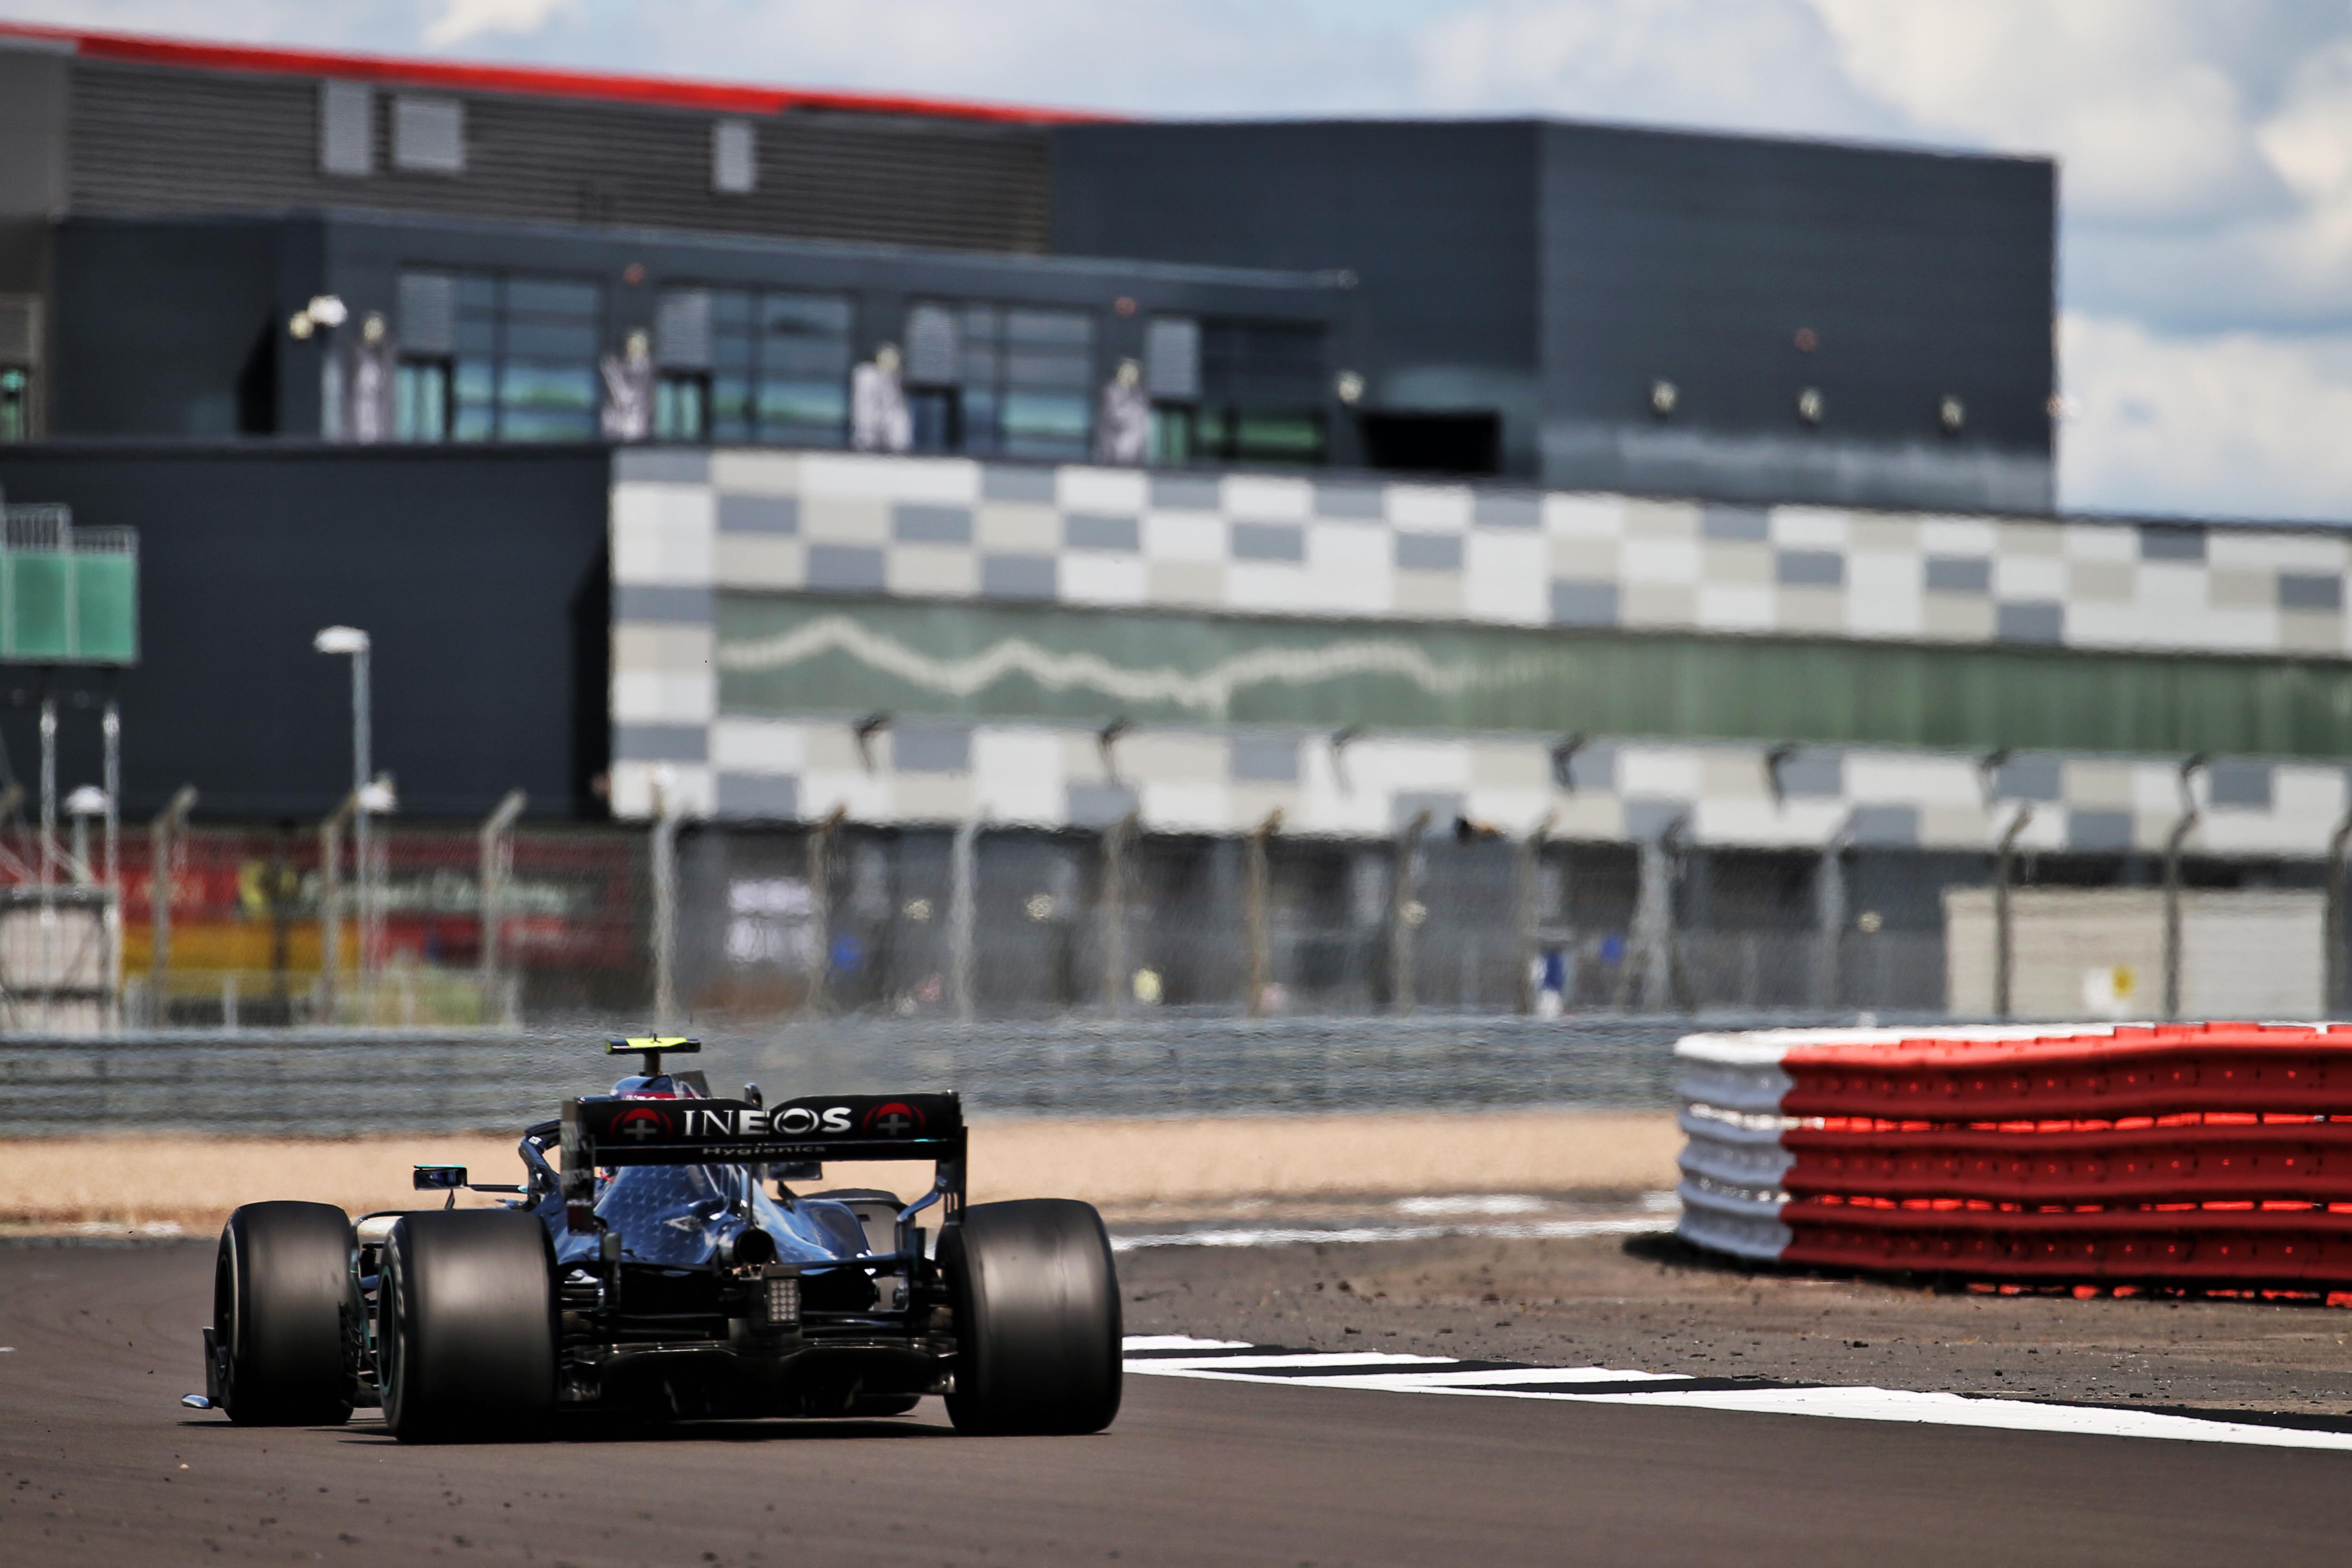 Valtteri Bottas Mercedes F1 2020